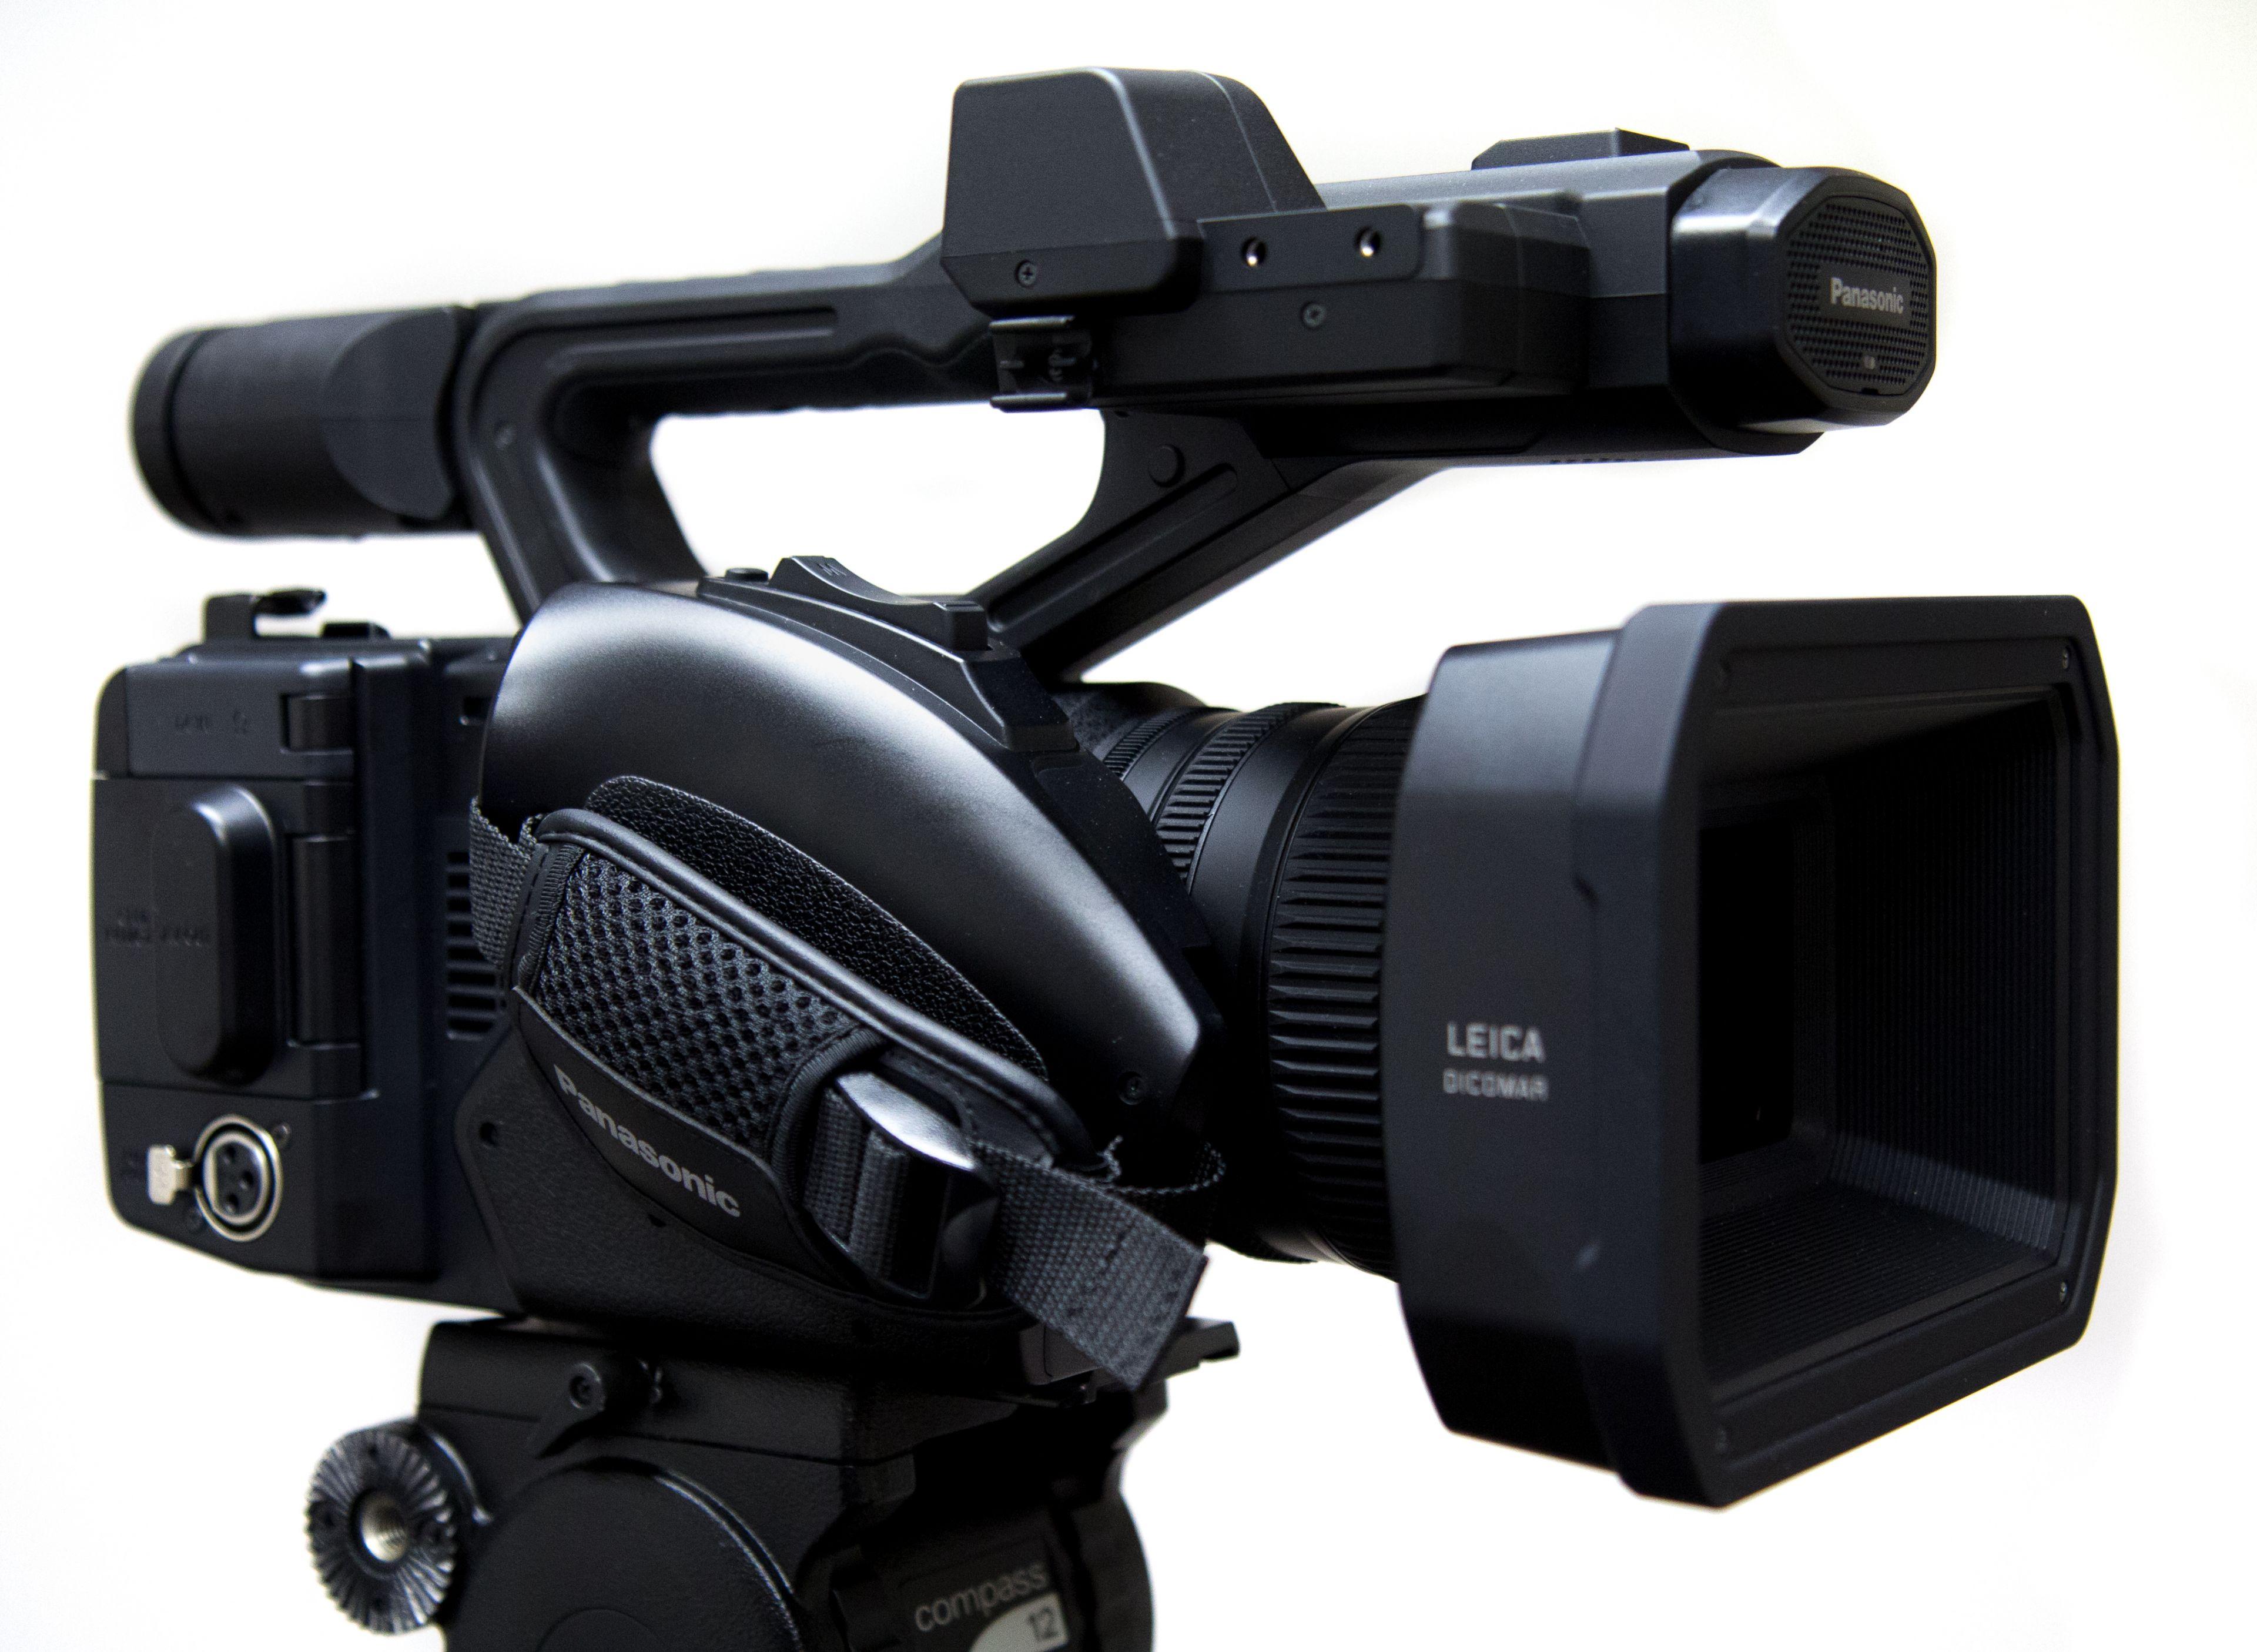 Panasonic AG-UX180 Single Lens Camera Review